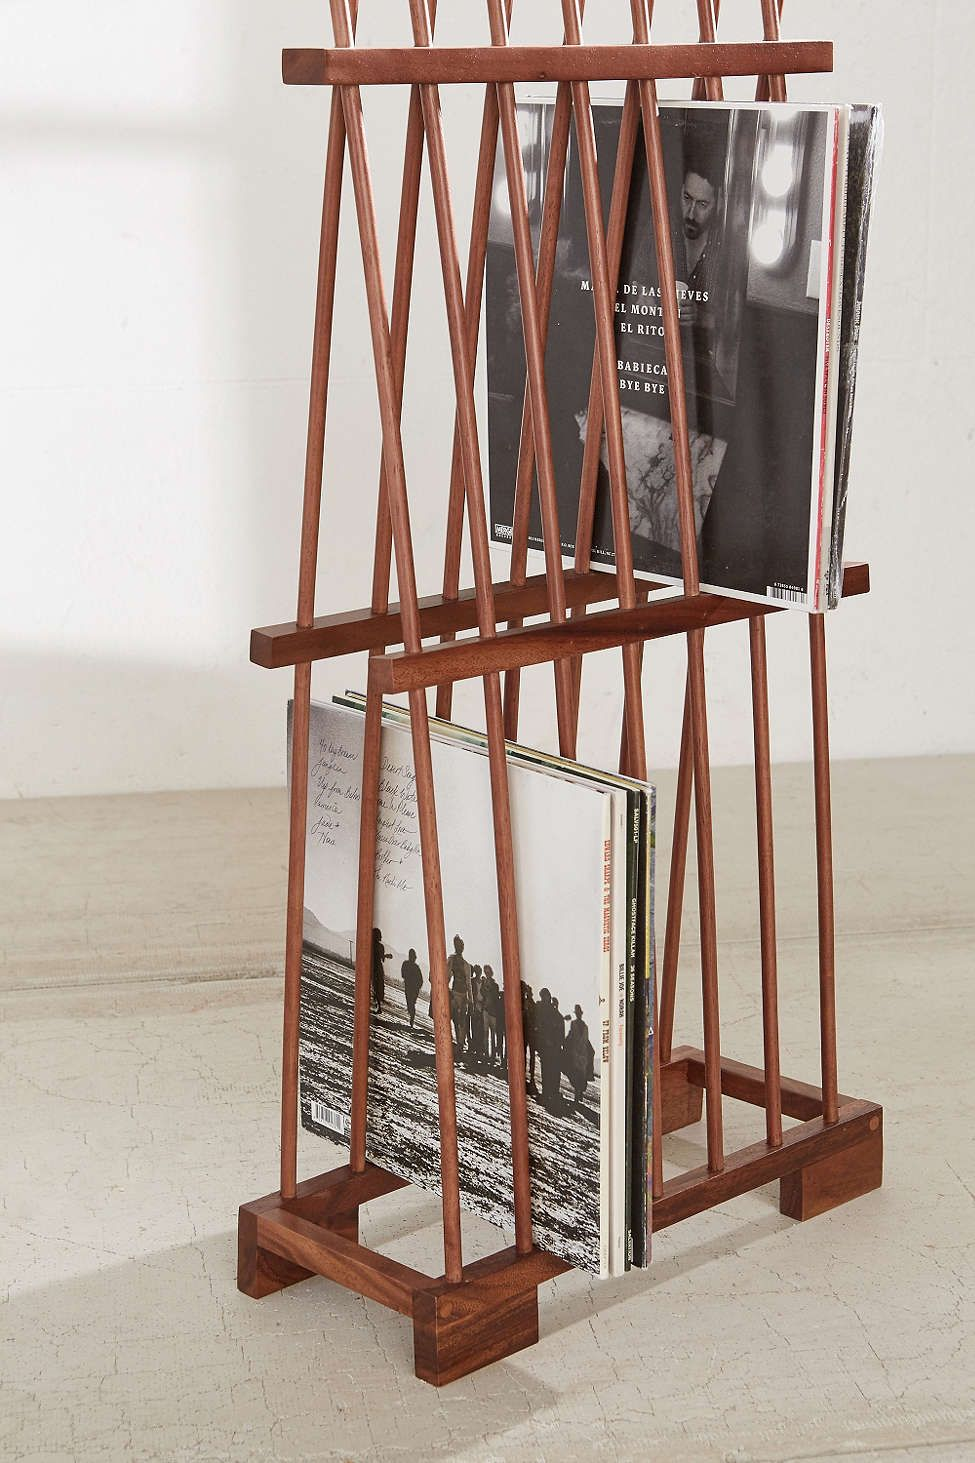 Alexander Vinyl Storage Rack | Pinterest | Vinyl storage, Storage ...